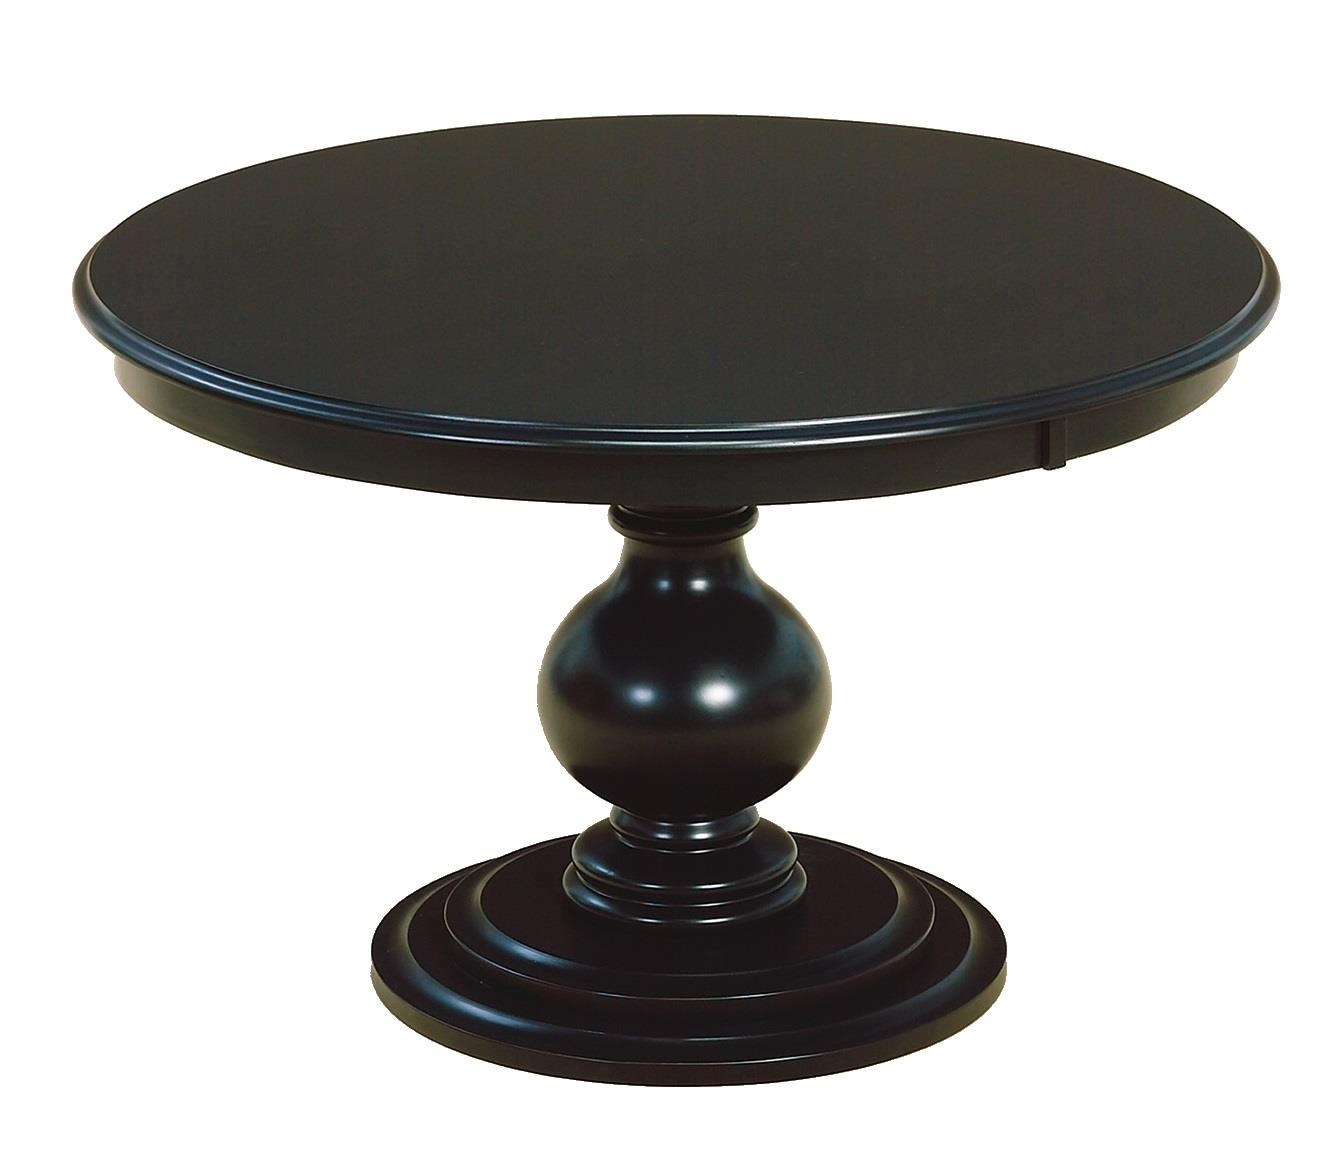 Kountry Knob Stanton Single Pedestal Table by Wayside Custom Furniture at Wayside Furniture